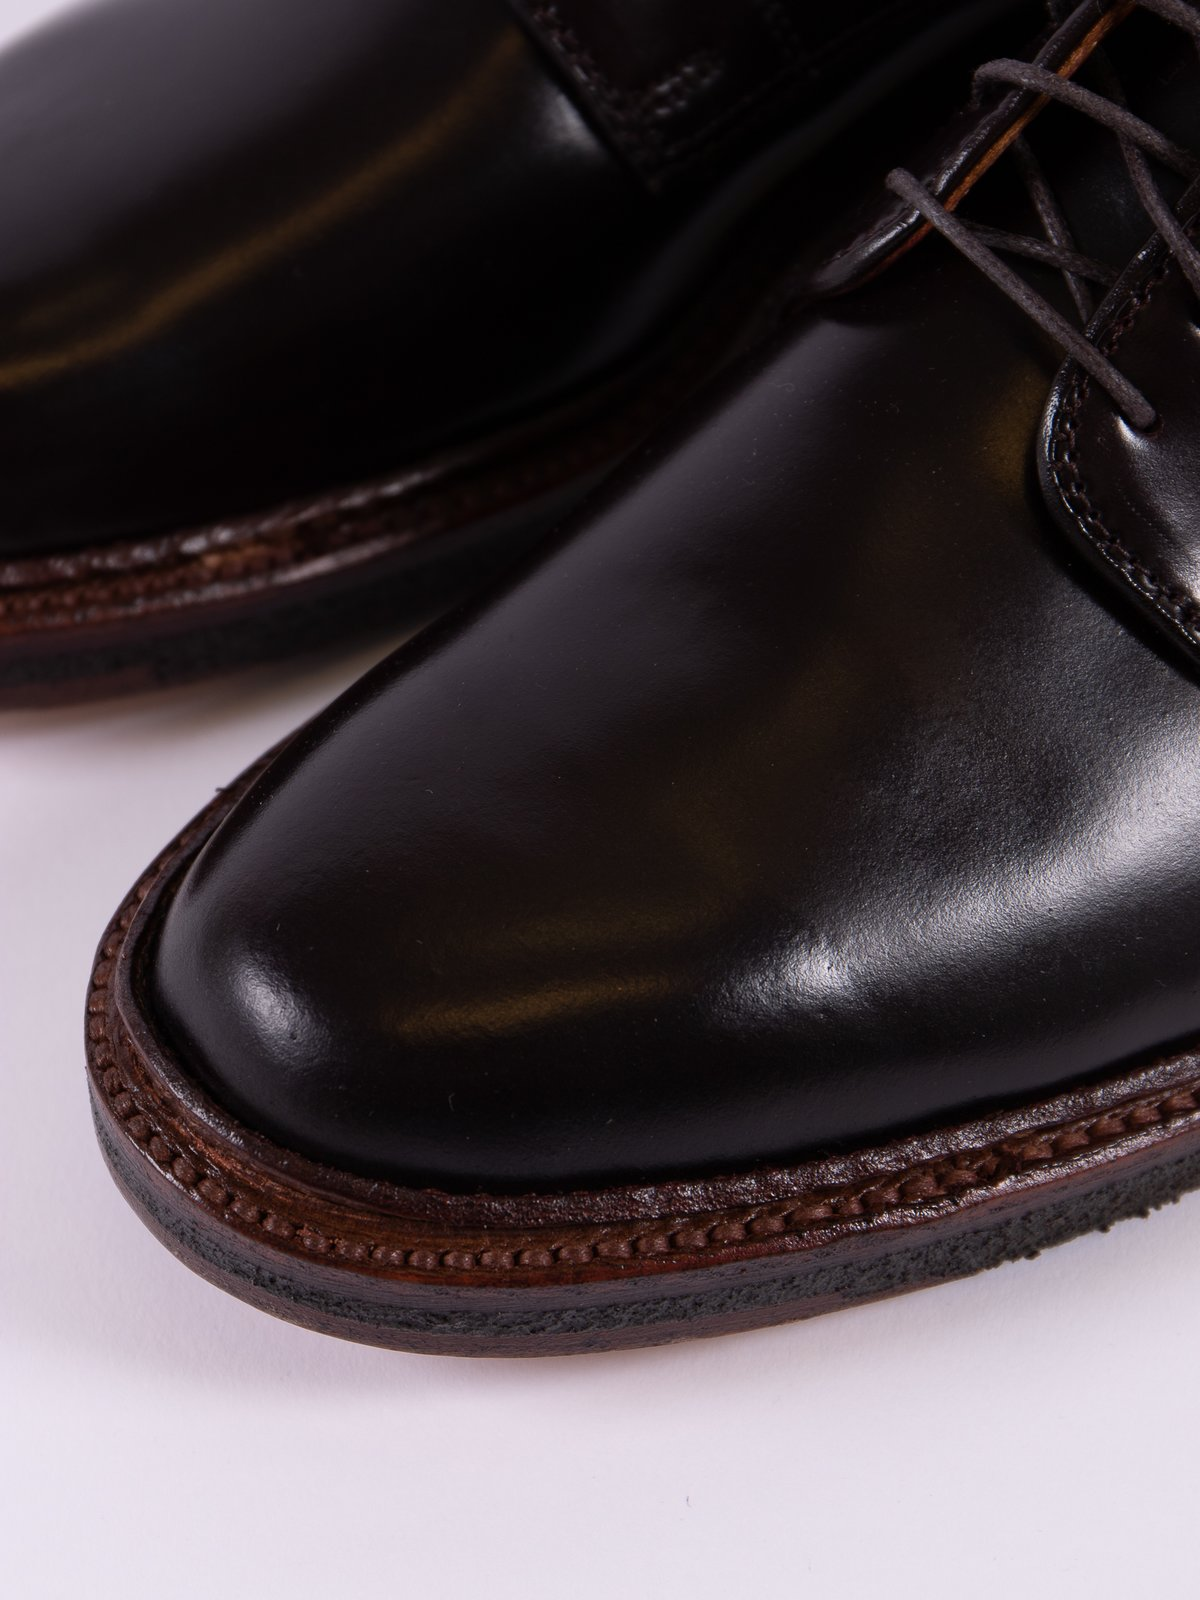 Color 8 Cordovan Plain Toe Blucher with Crepe Sole - Image 3